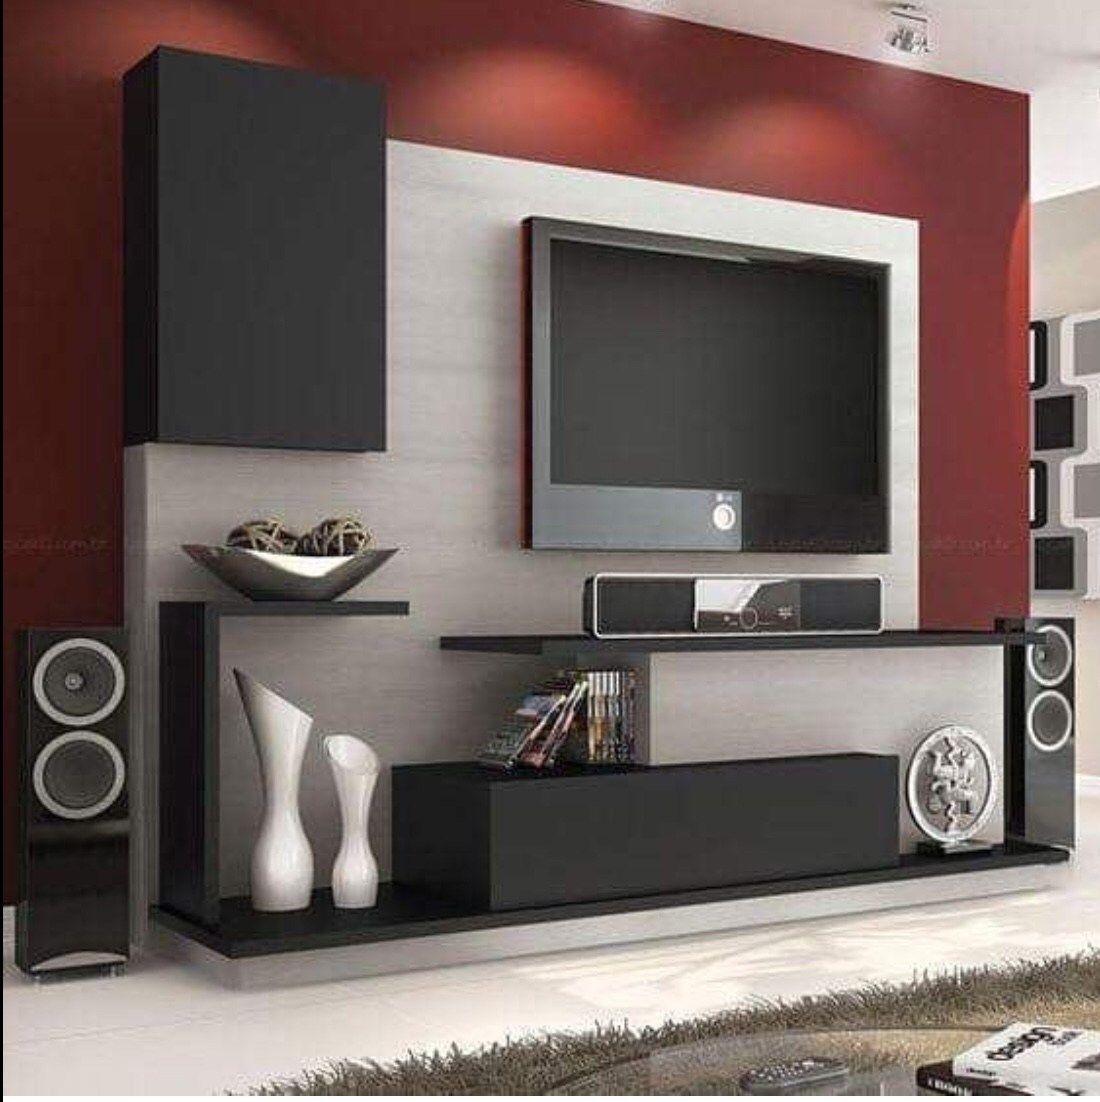 30 Amazing Tv Unit Design Ideas For Your Living Room The Wonder Cottage Living Room Tv Unit Designs Living Room Tv Unit Modern Tv Wall Units